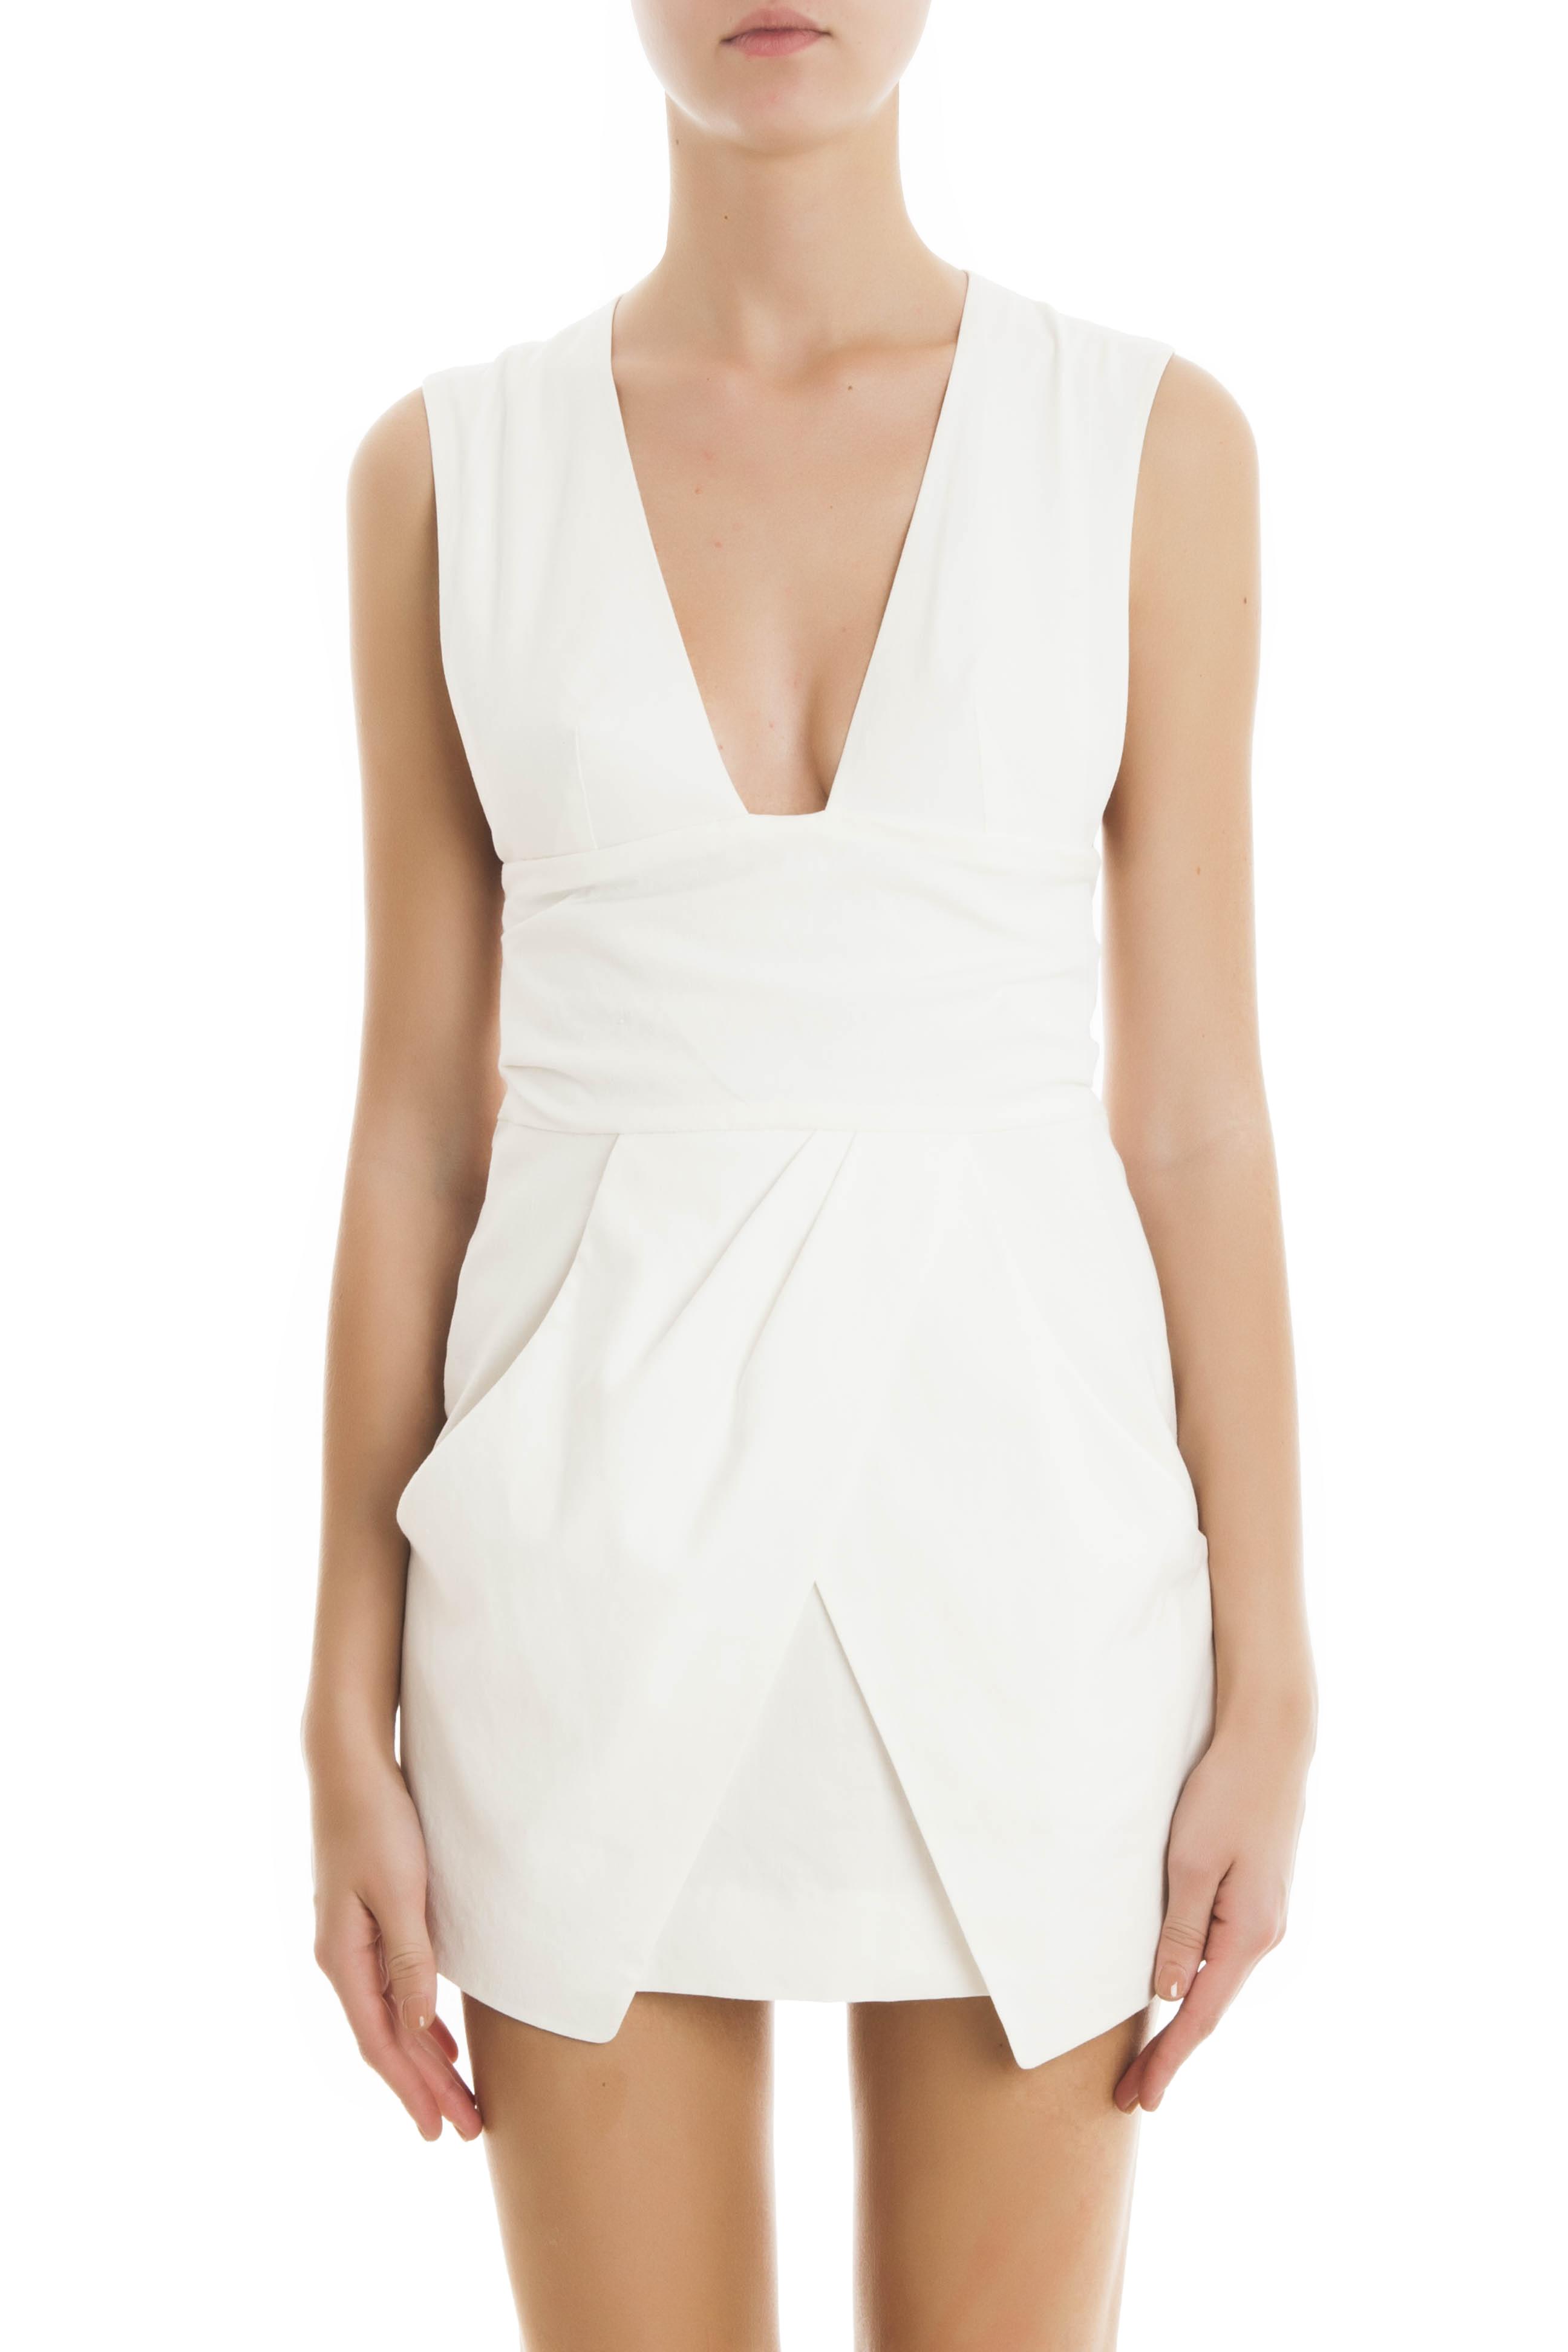 Isabel marant imba dress in white lyst for Isabel marant shirt dress